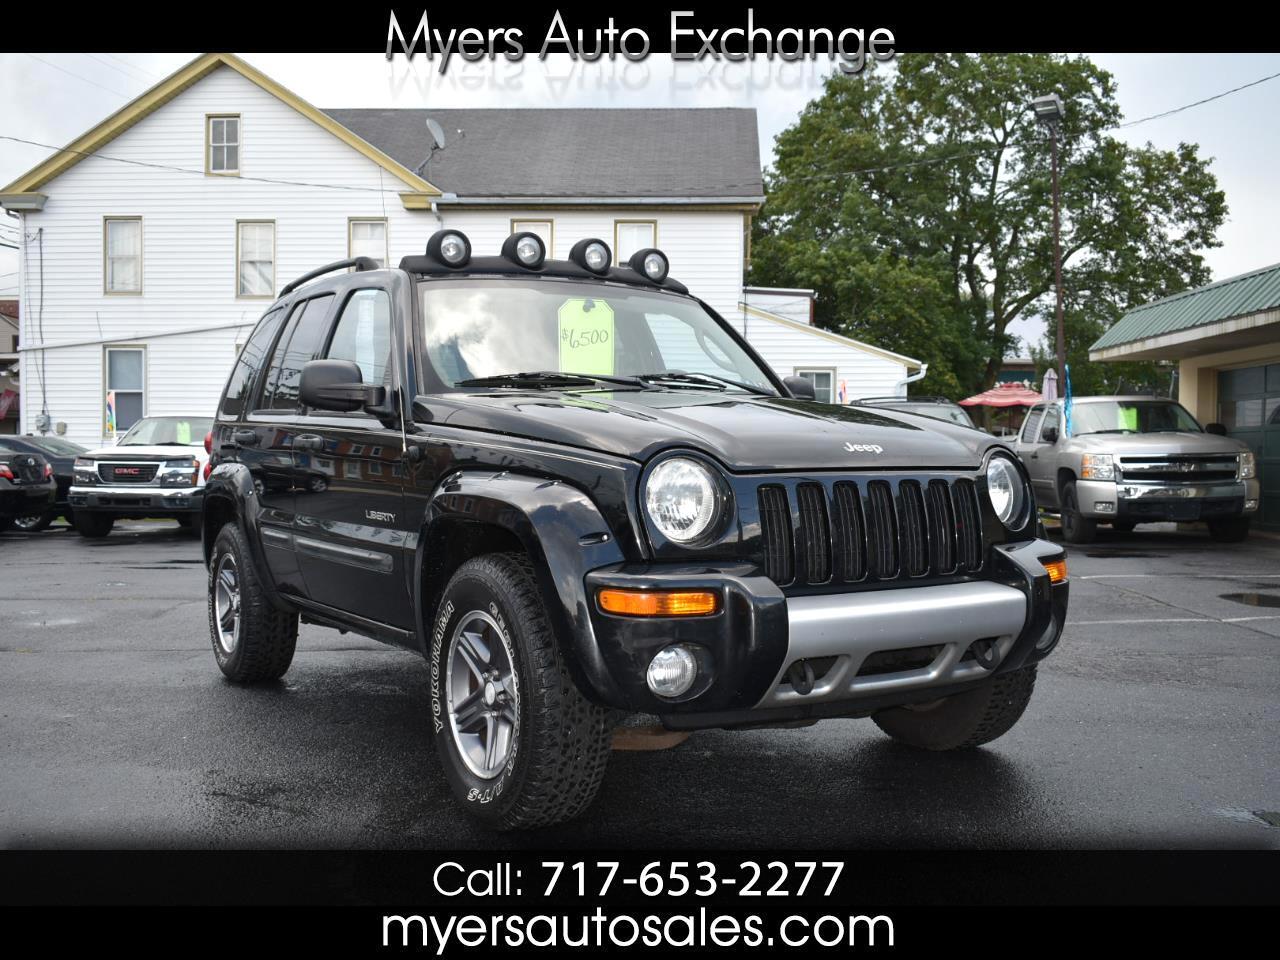 2004 Jeep Liberty Renegade 4WD